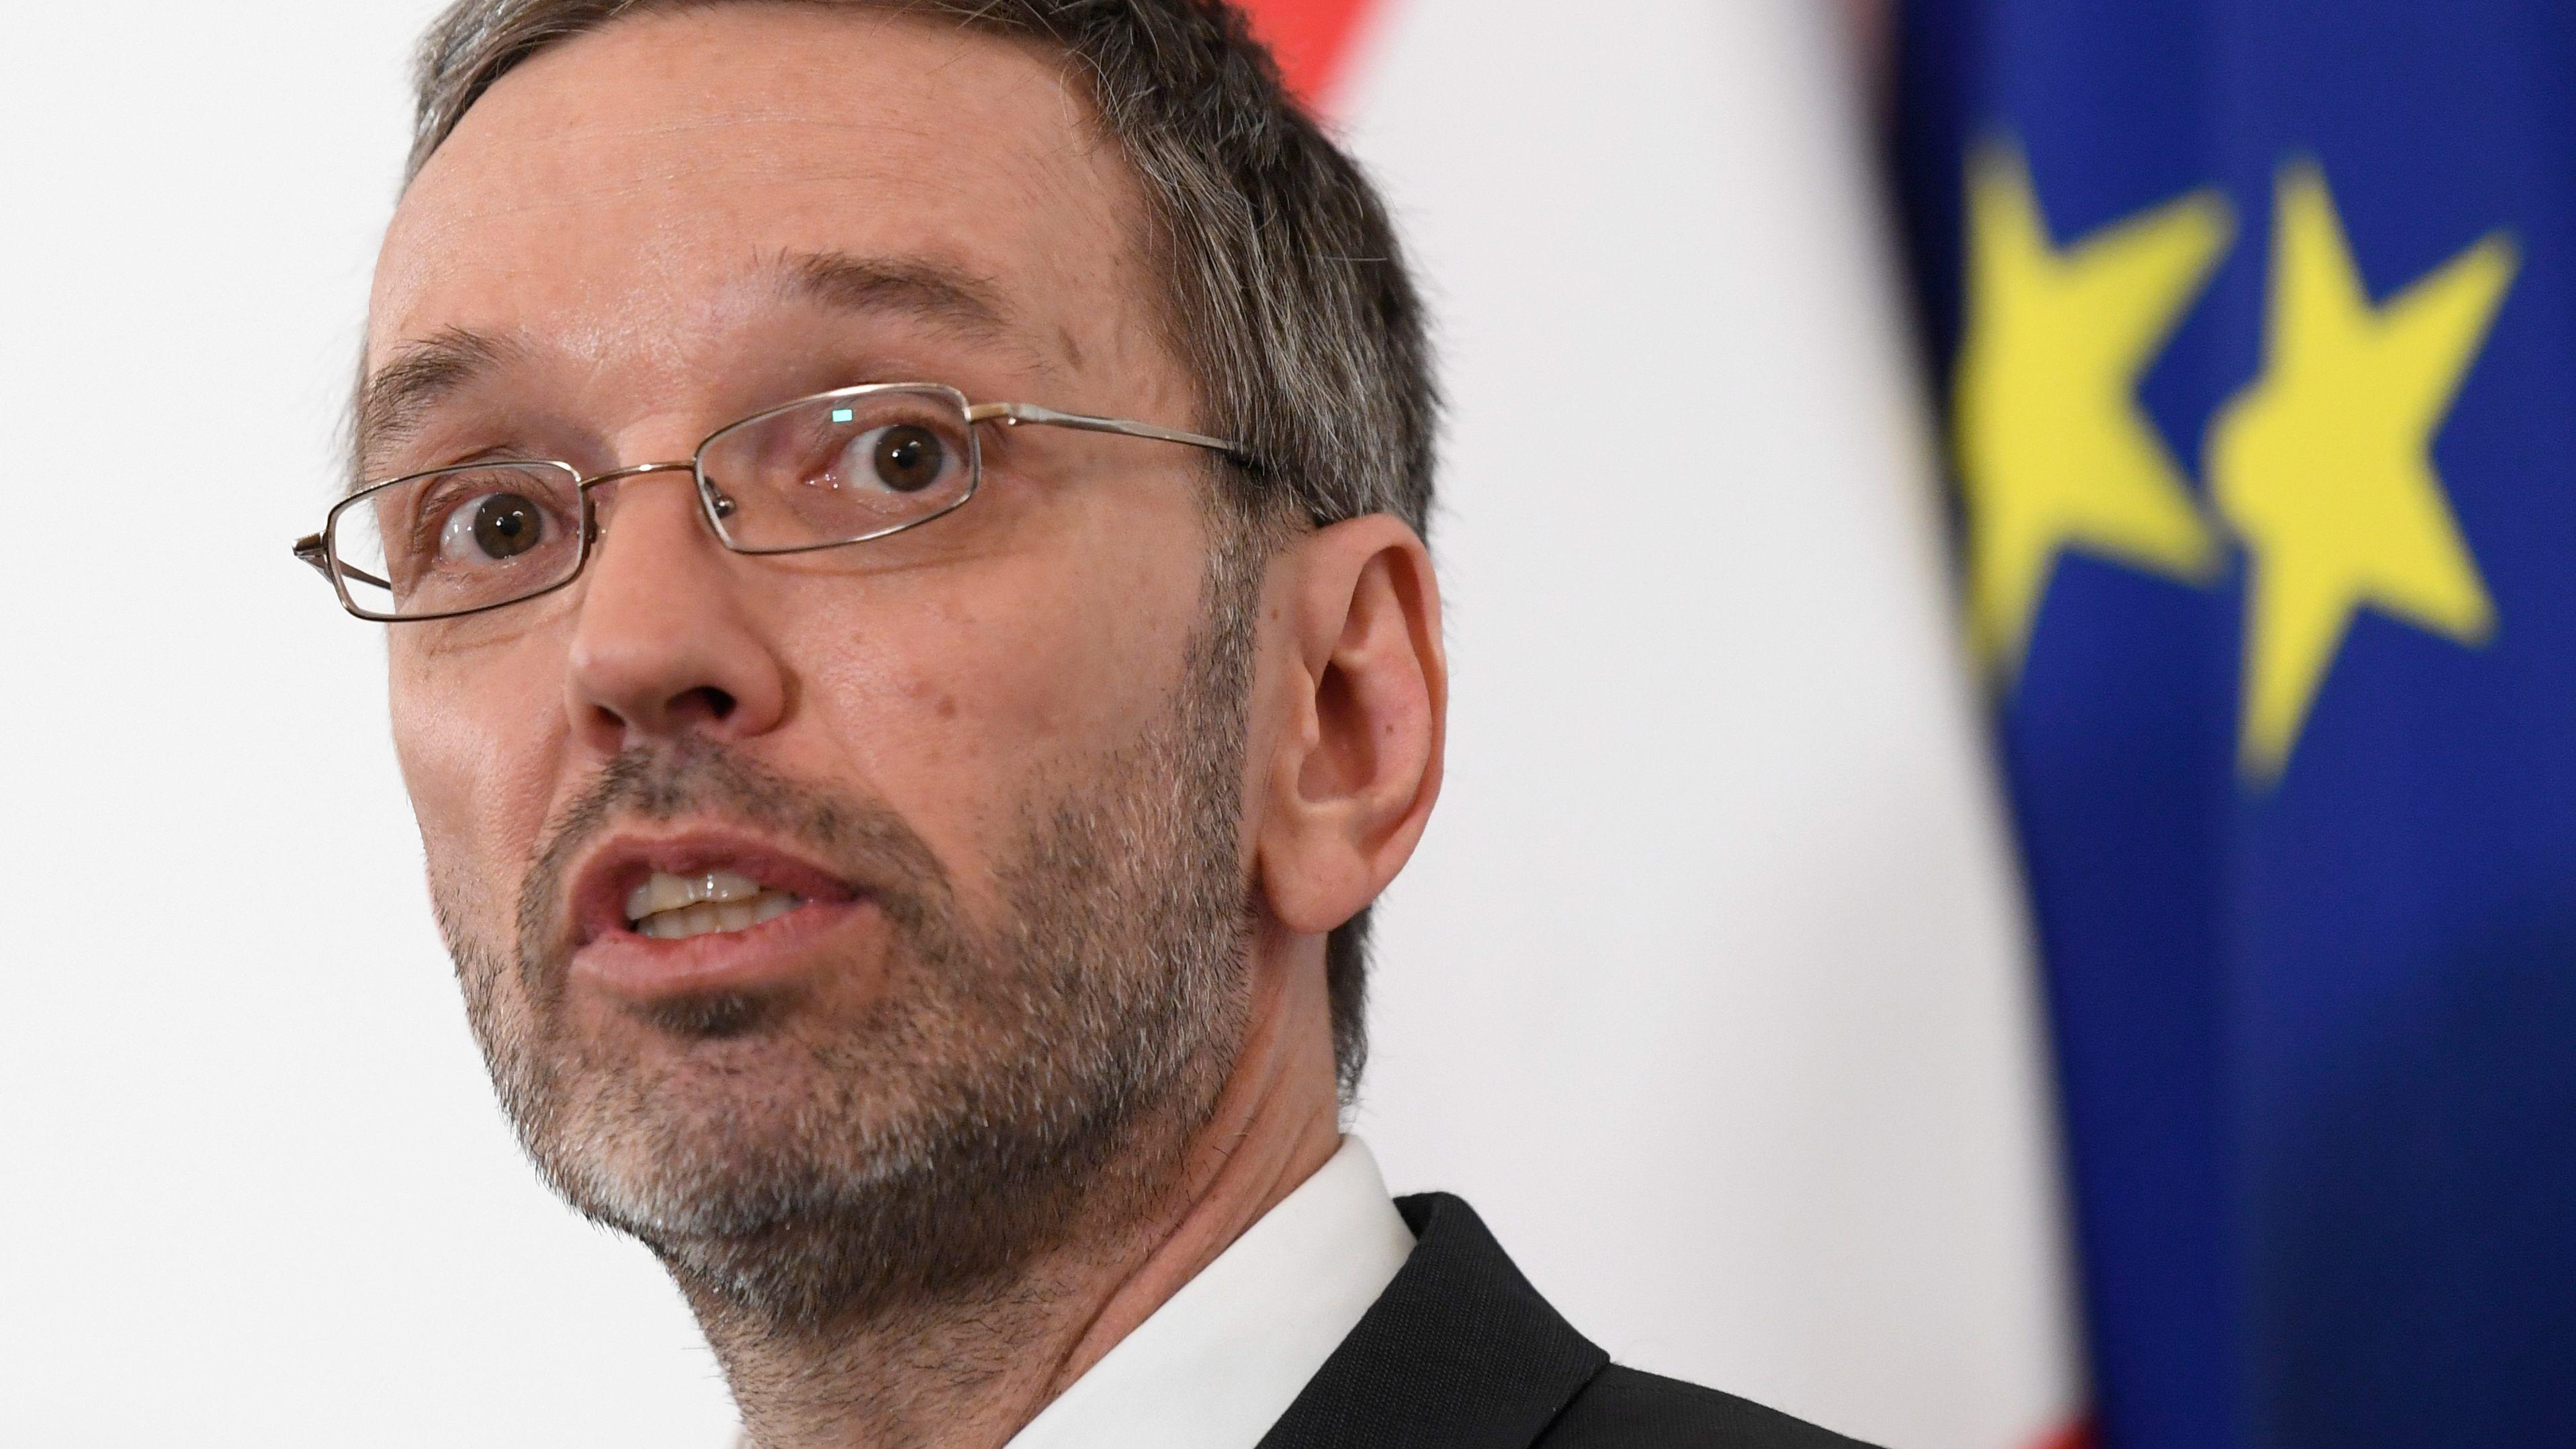 Opposition-ber-Kritik-an-1-50-Euro-Stundenlohn-f-r-Asylwerber